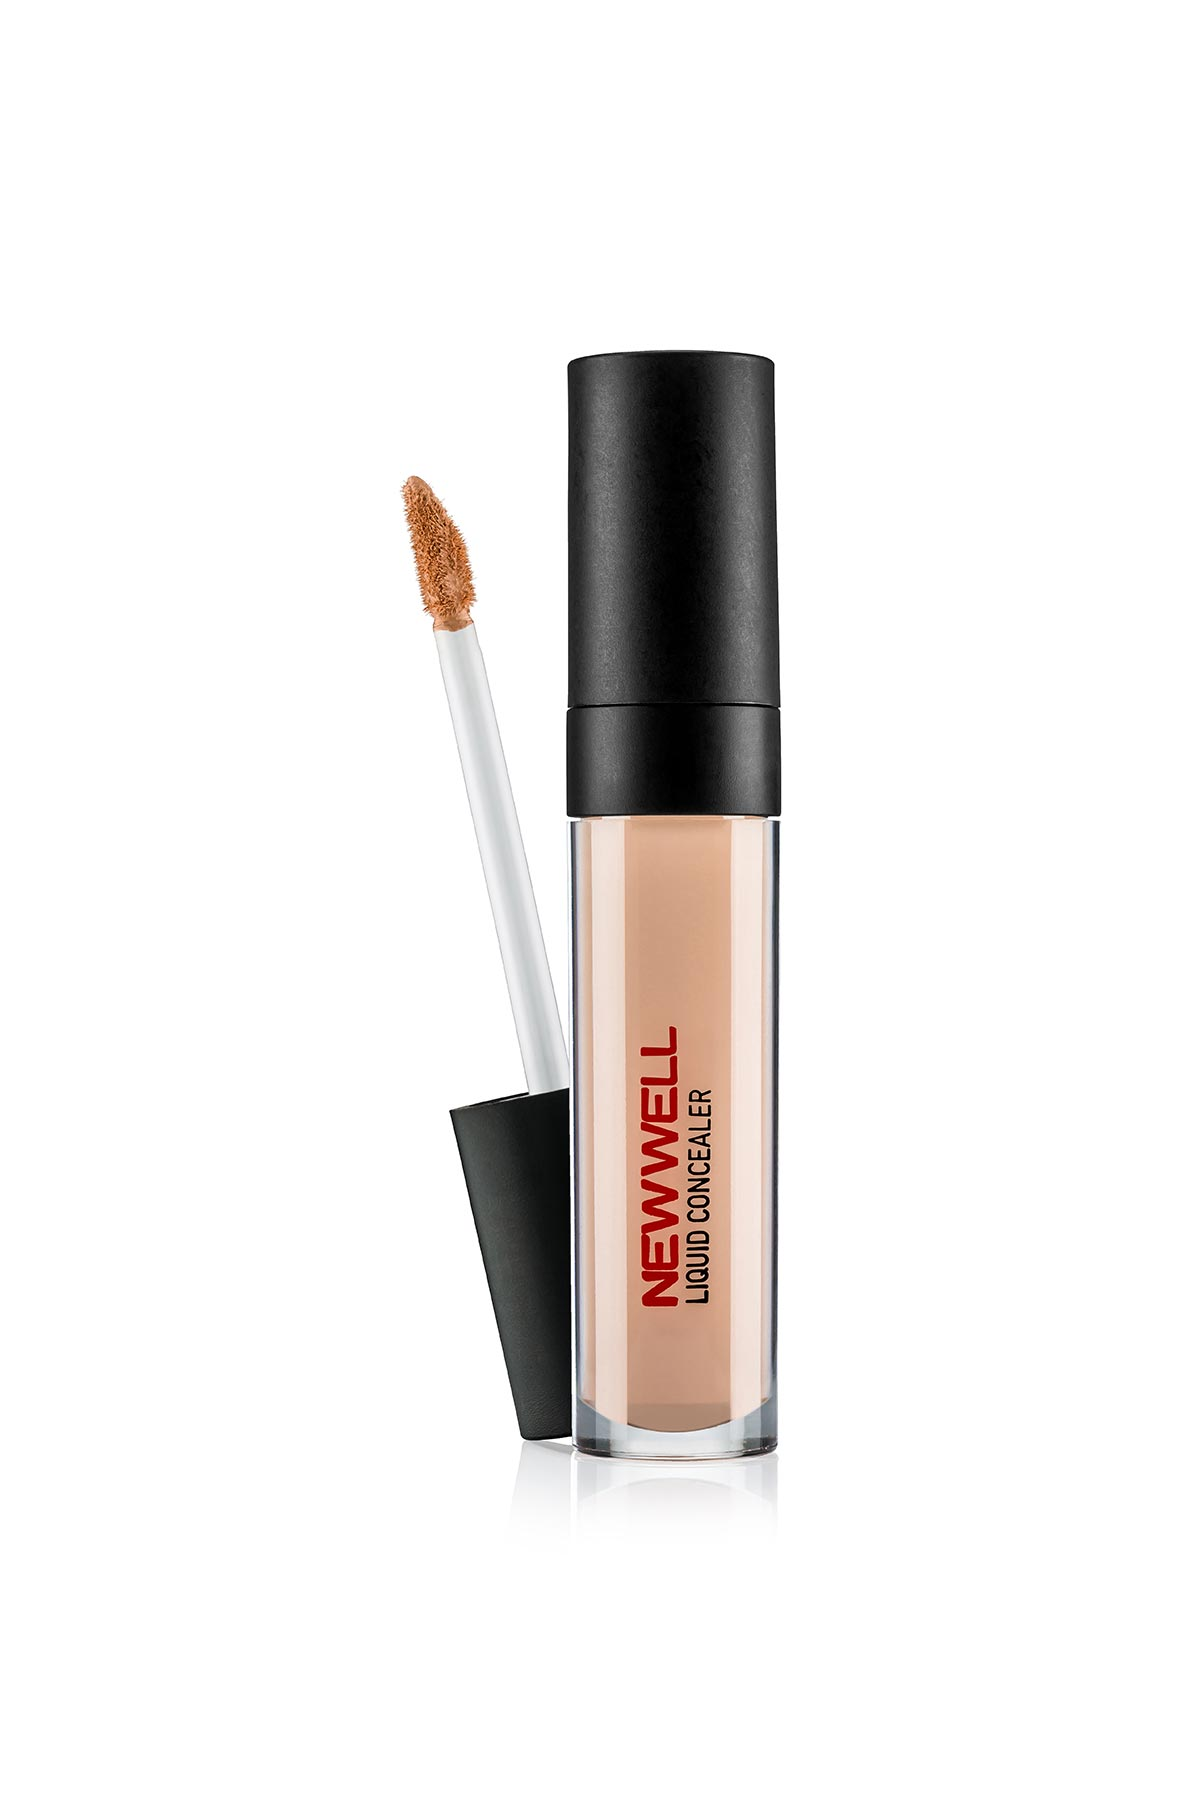 Newwell-Liquid-Concealer-114 Duftzwillinge, Parfum Dupes, Duftzwilling, Parfum Dupe, Duftalternative, Parfumzwillinge, Parfum liste, Duftzwillinge Liste